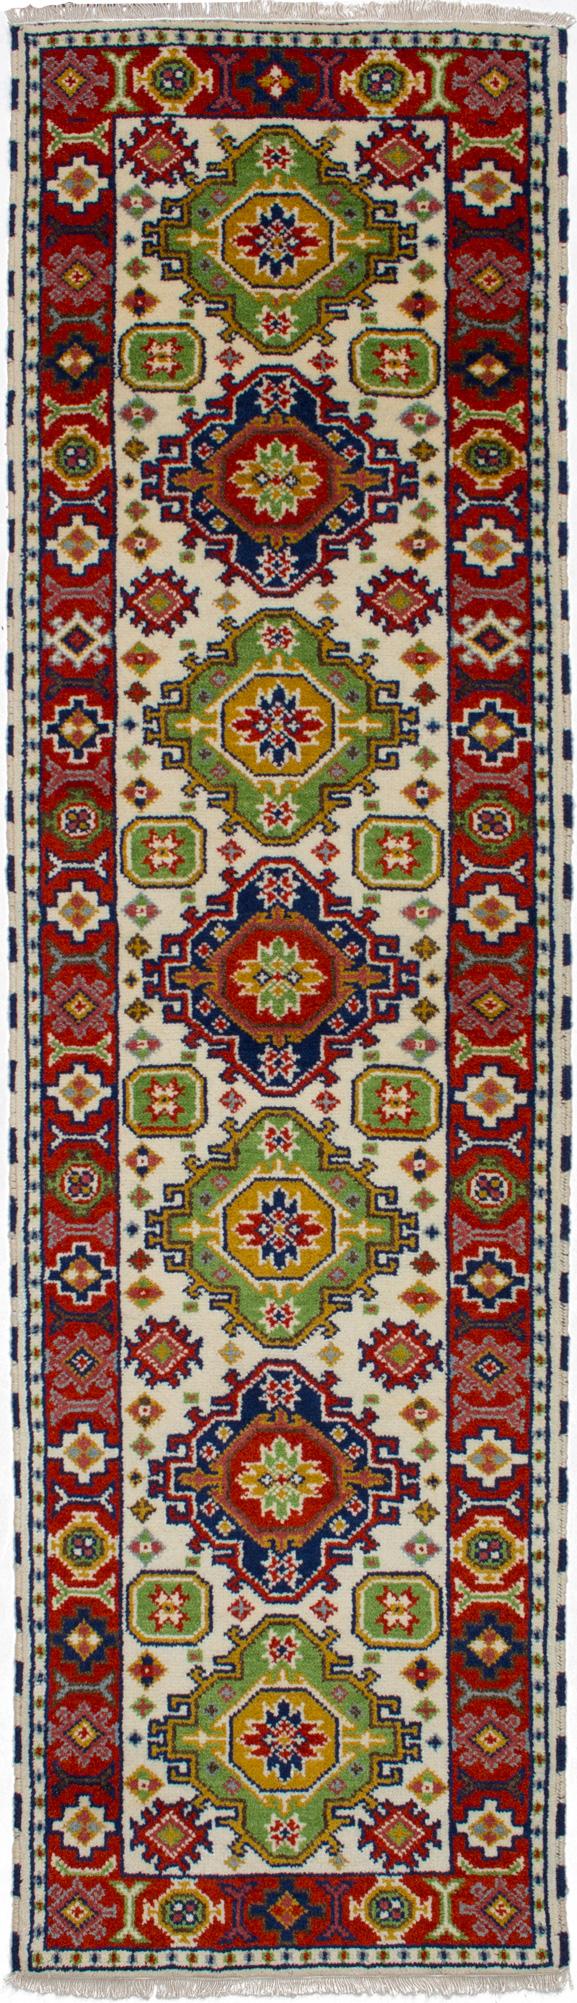 "Hand-knotted Royal Kazak Beige Wool Rug 2'9"" x 9'8"" Size: 2'9"" x 9'8"""